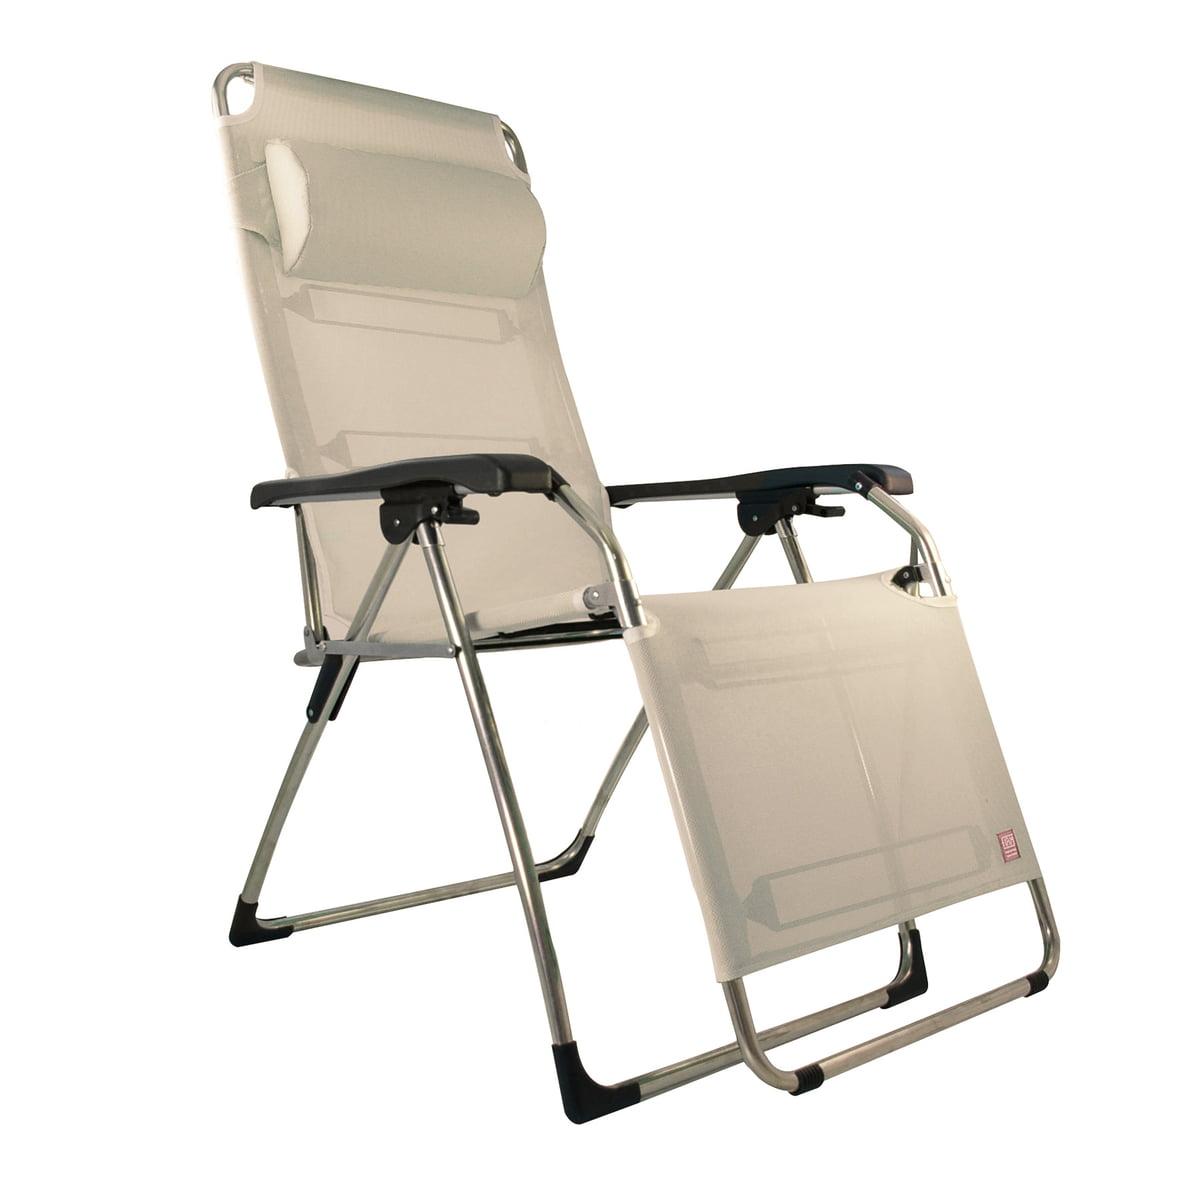 amida chaise longue en aluminium par fiam. Black Bedroom Furniture Sets. Home Design Ideas